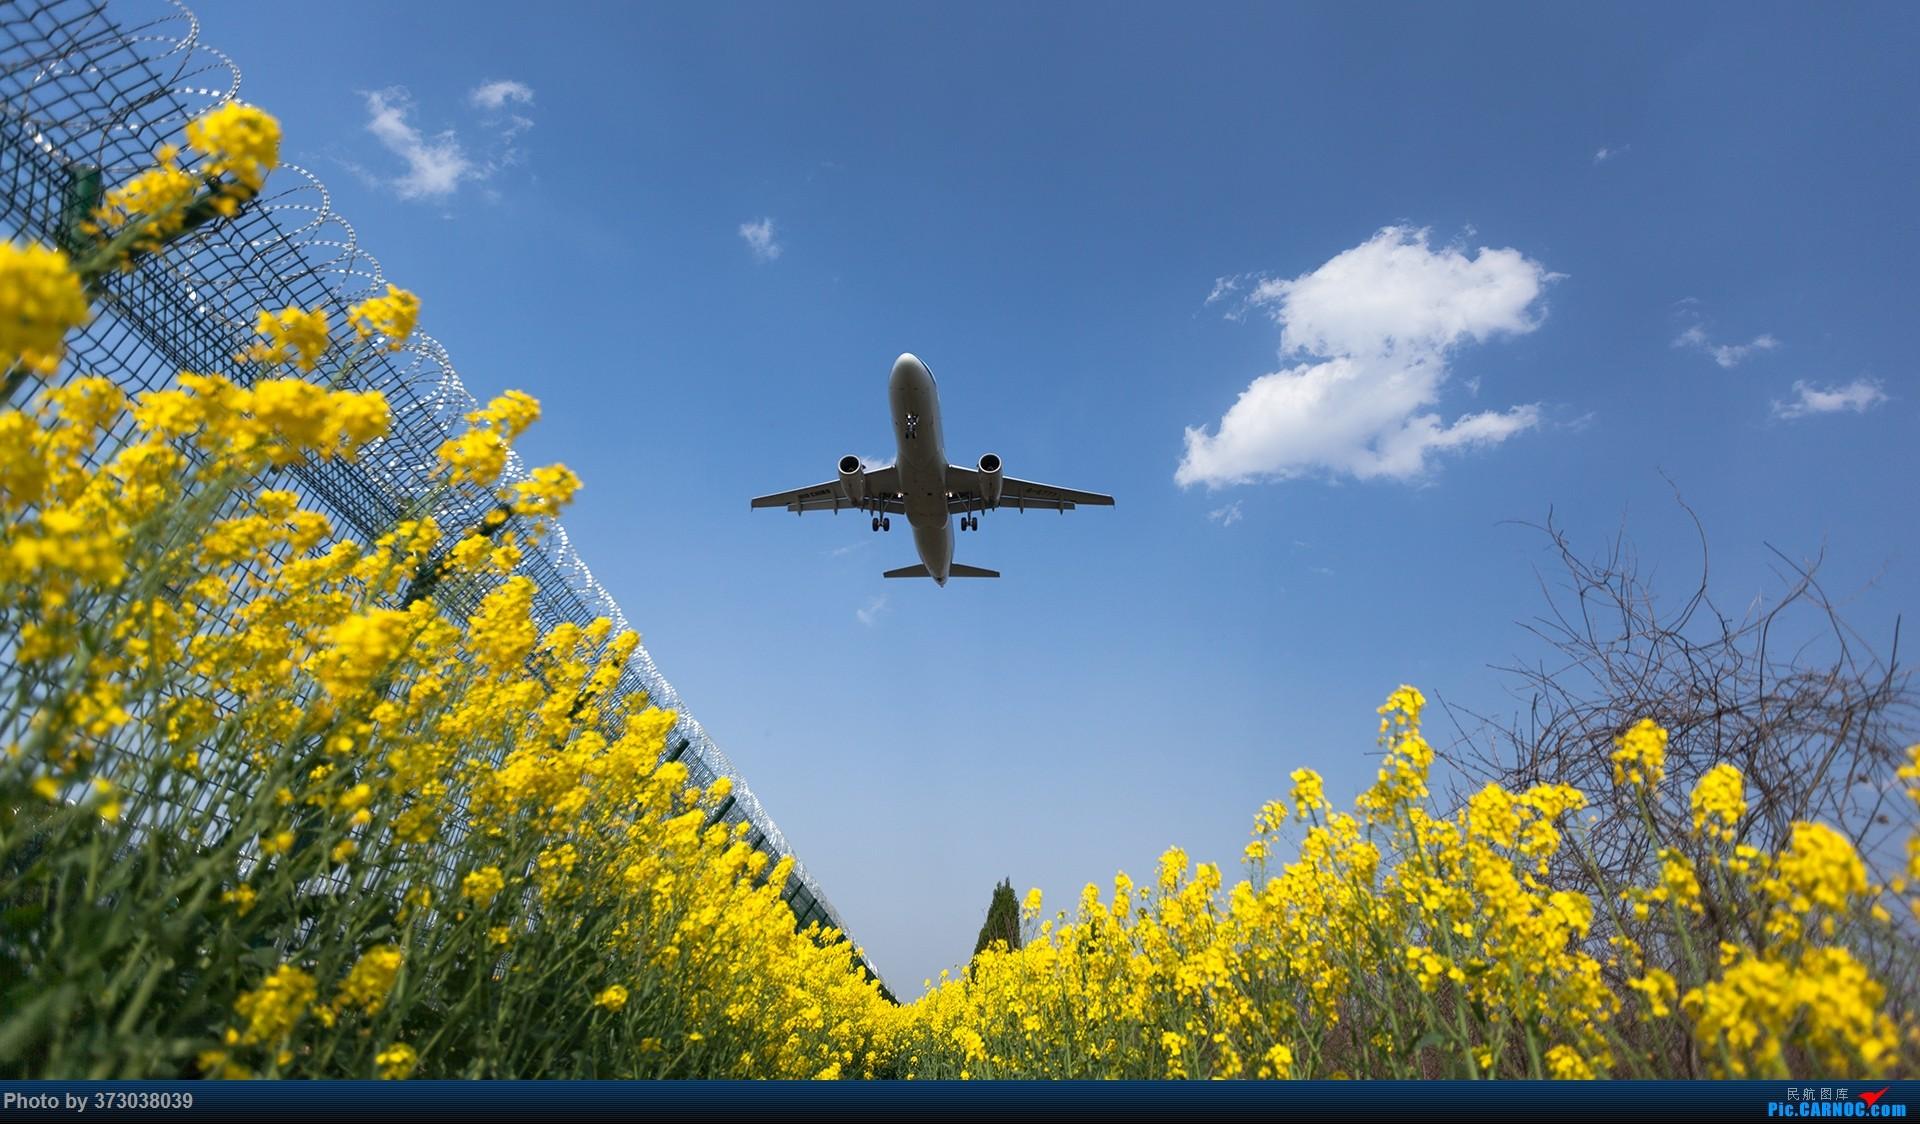 Re:[原创]【杭州飞友会】HGH油菜花里射大鸟,放上一只三角翼风筝 AIRBUS A320-200 B-6773 中国杭州萧山国际机场